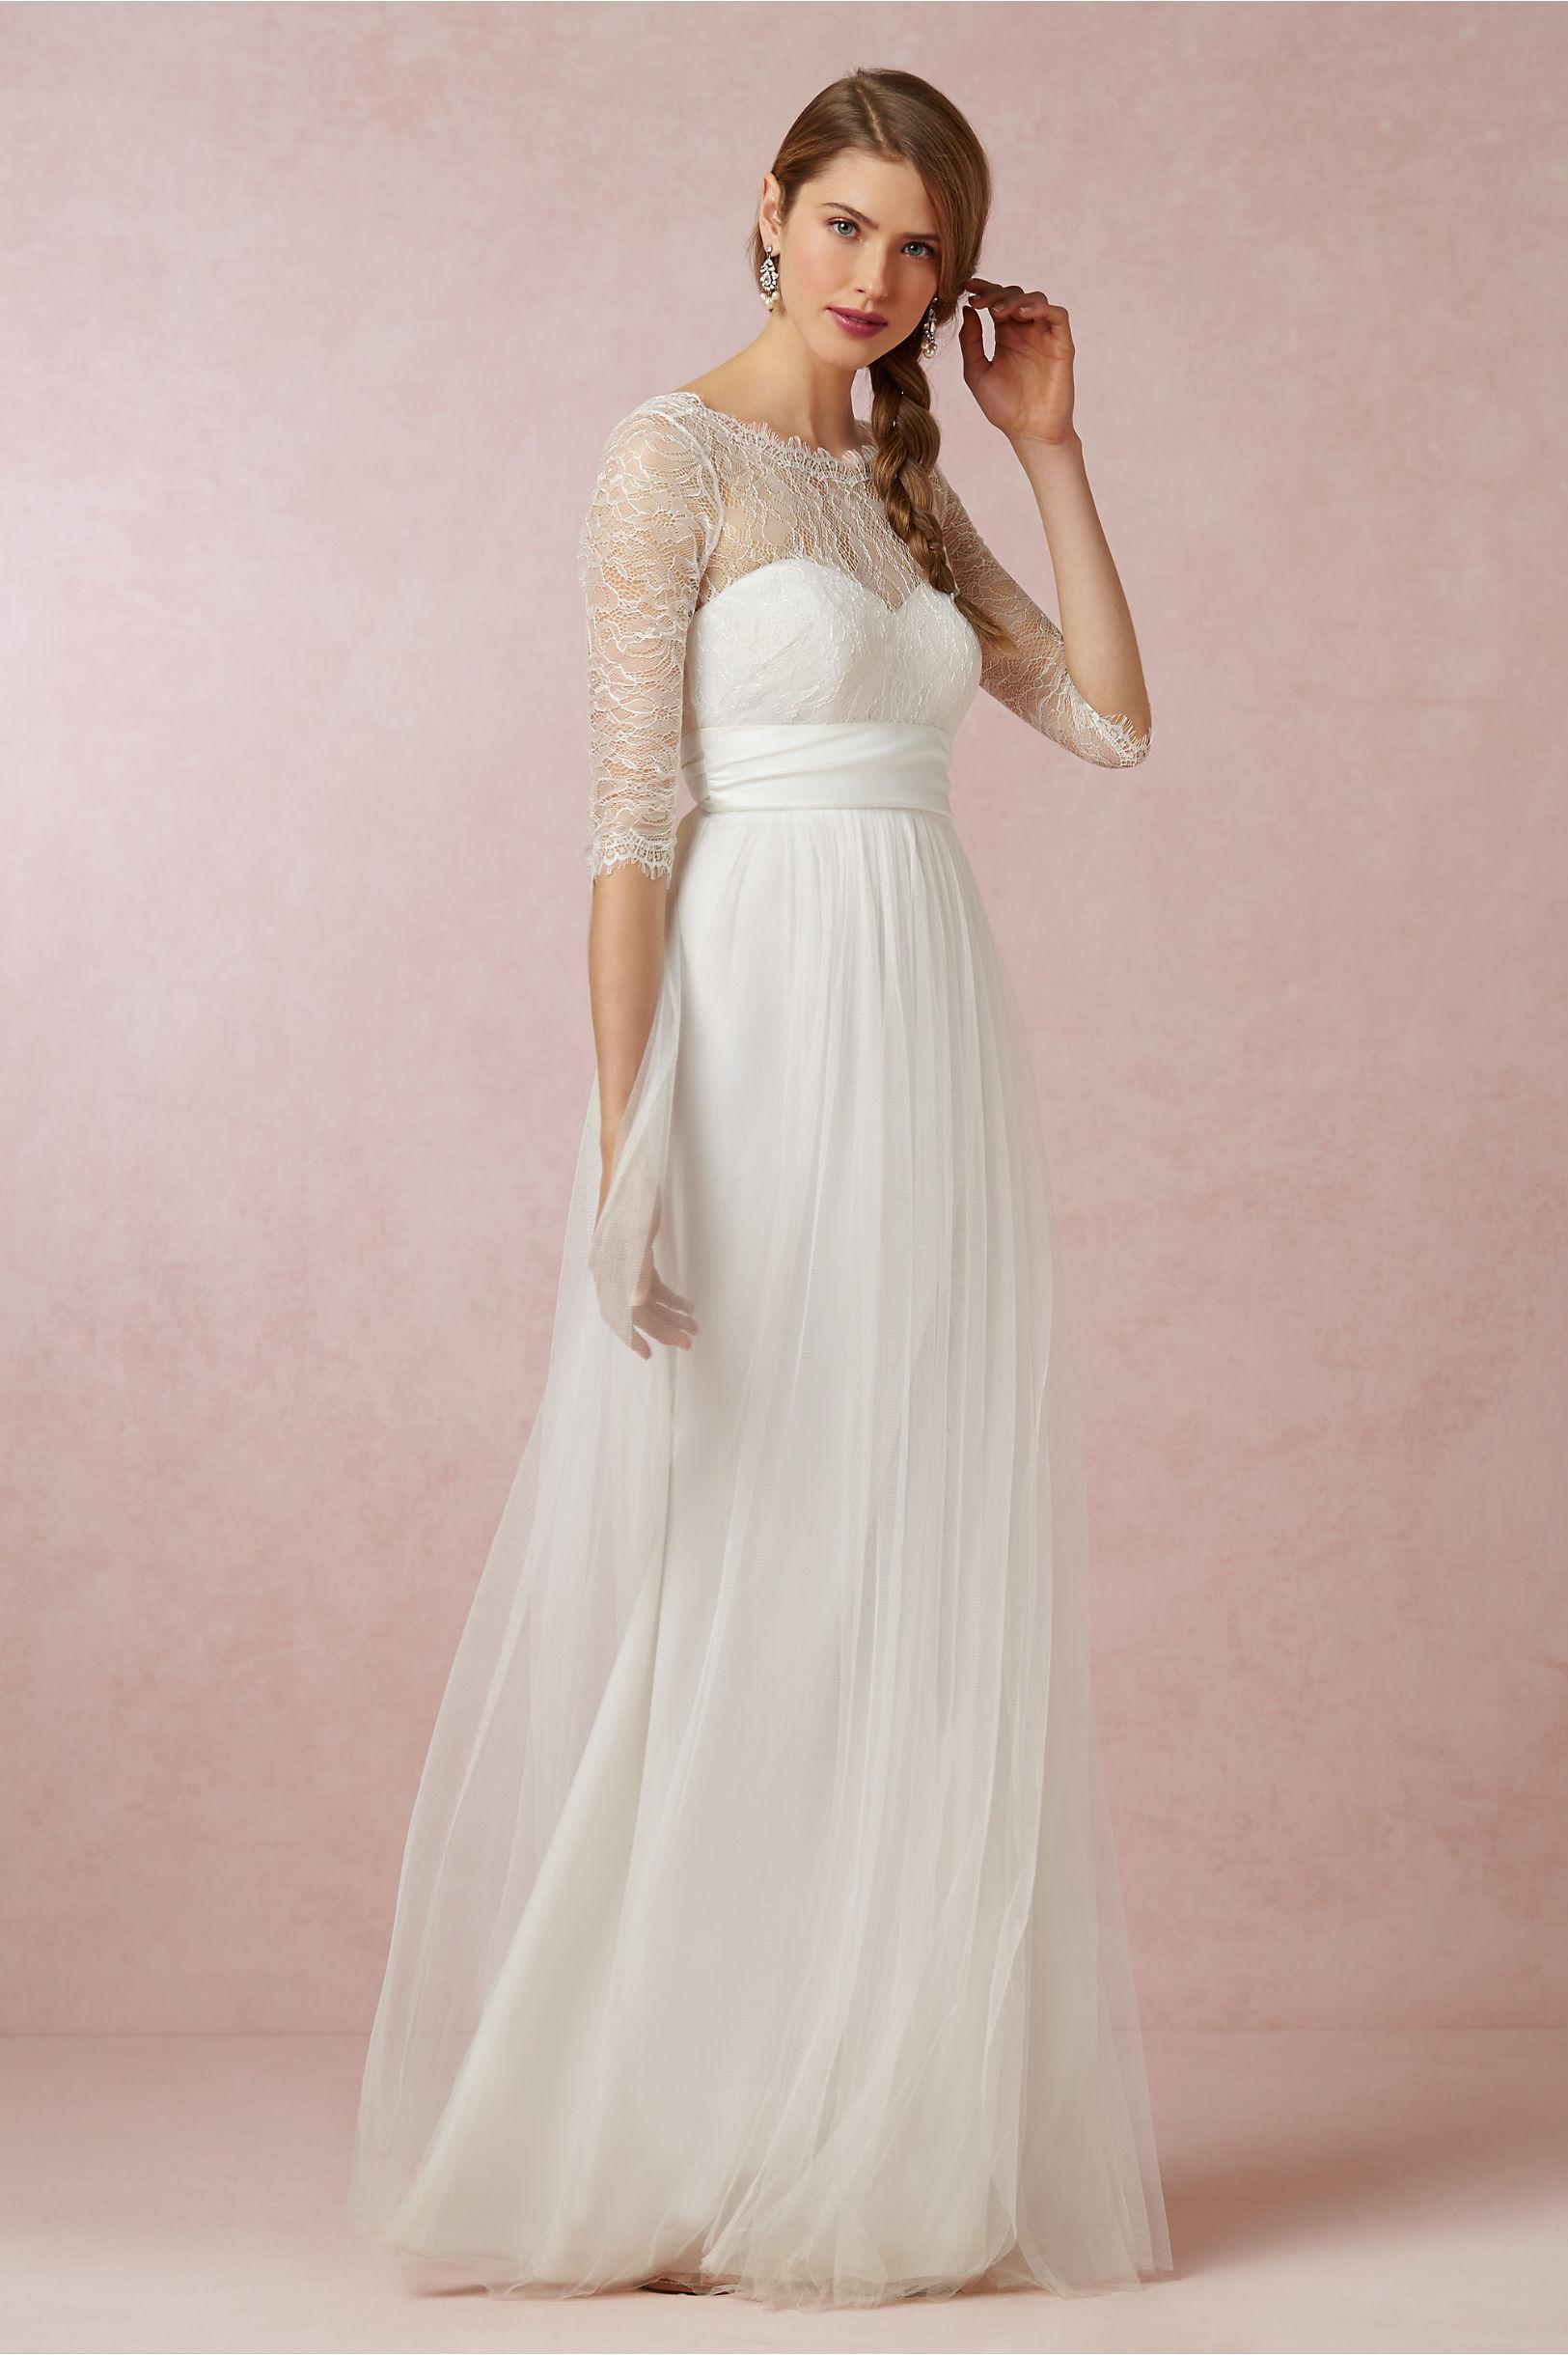 Annabelle Dress & Marnie Topper in Bride | BHLDN